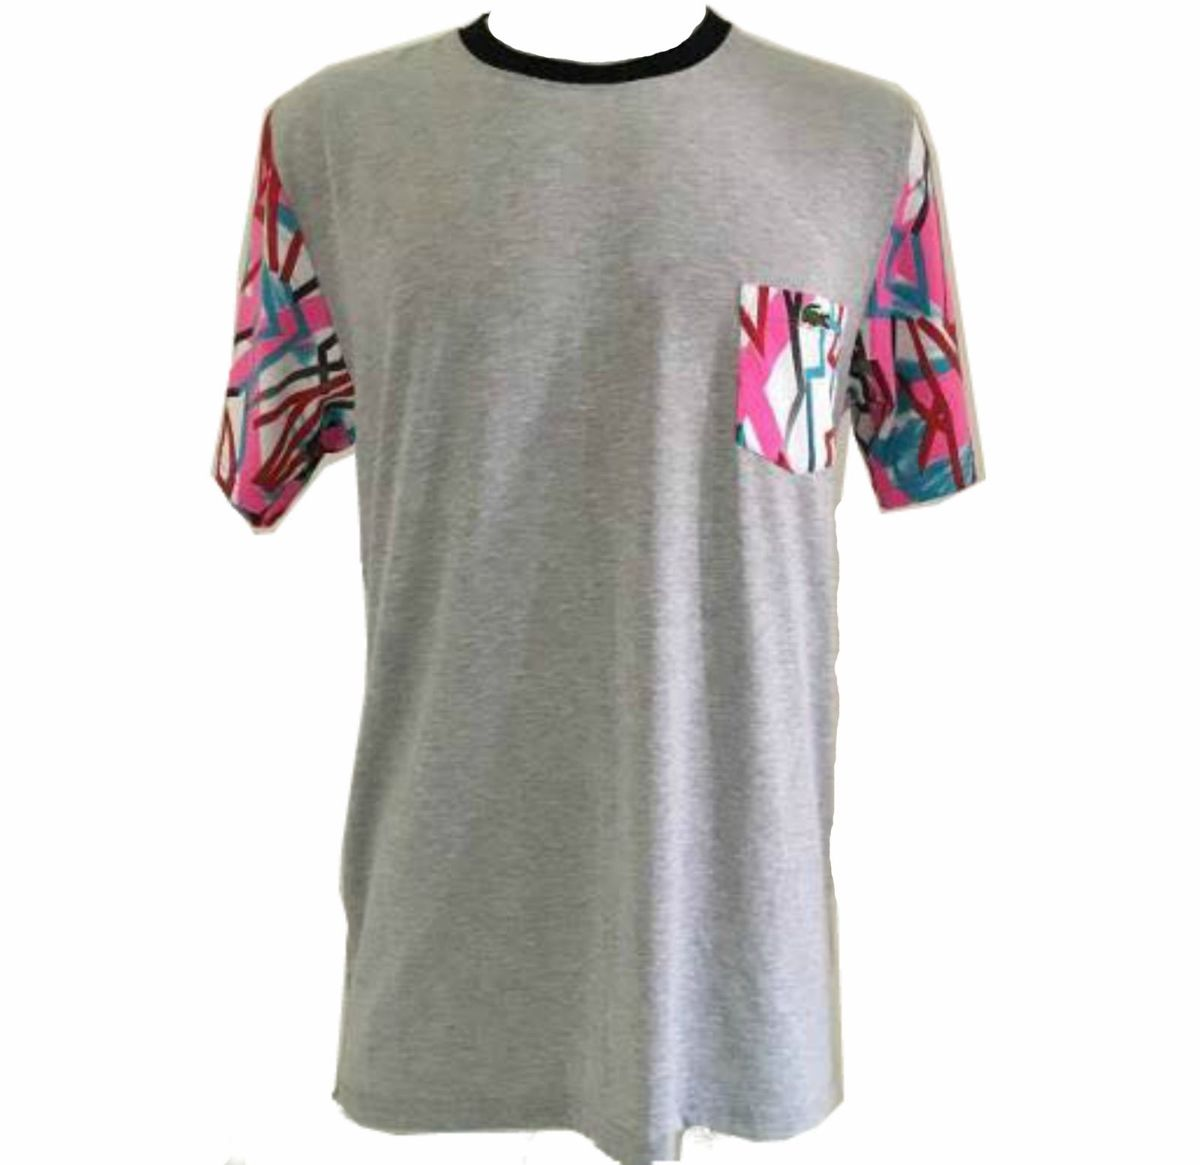 23191b894eb2f camisa camiseta lacoste live original com bolso cinza - camisas lacoste